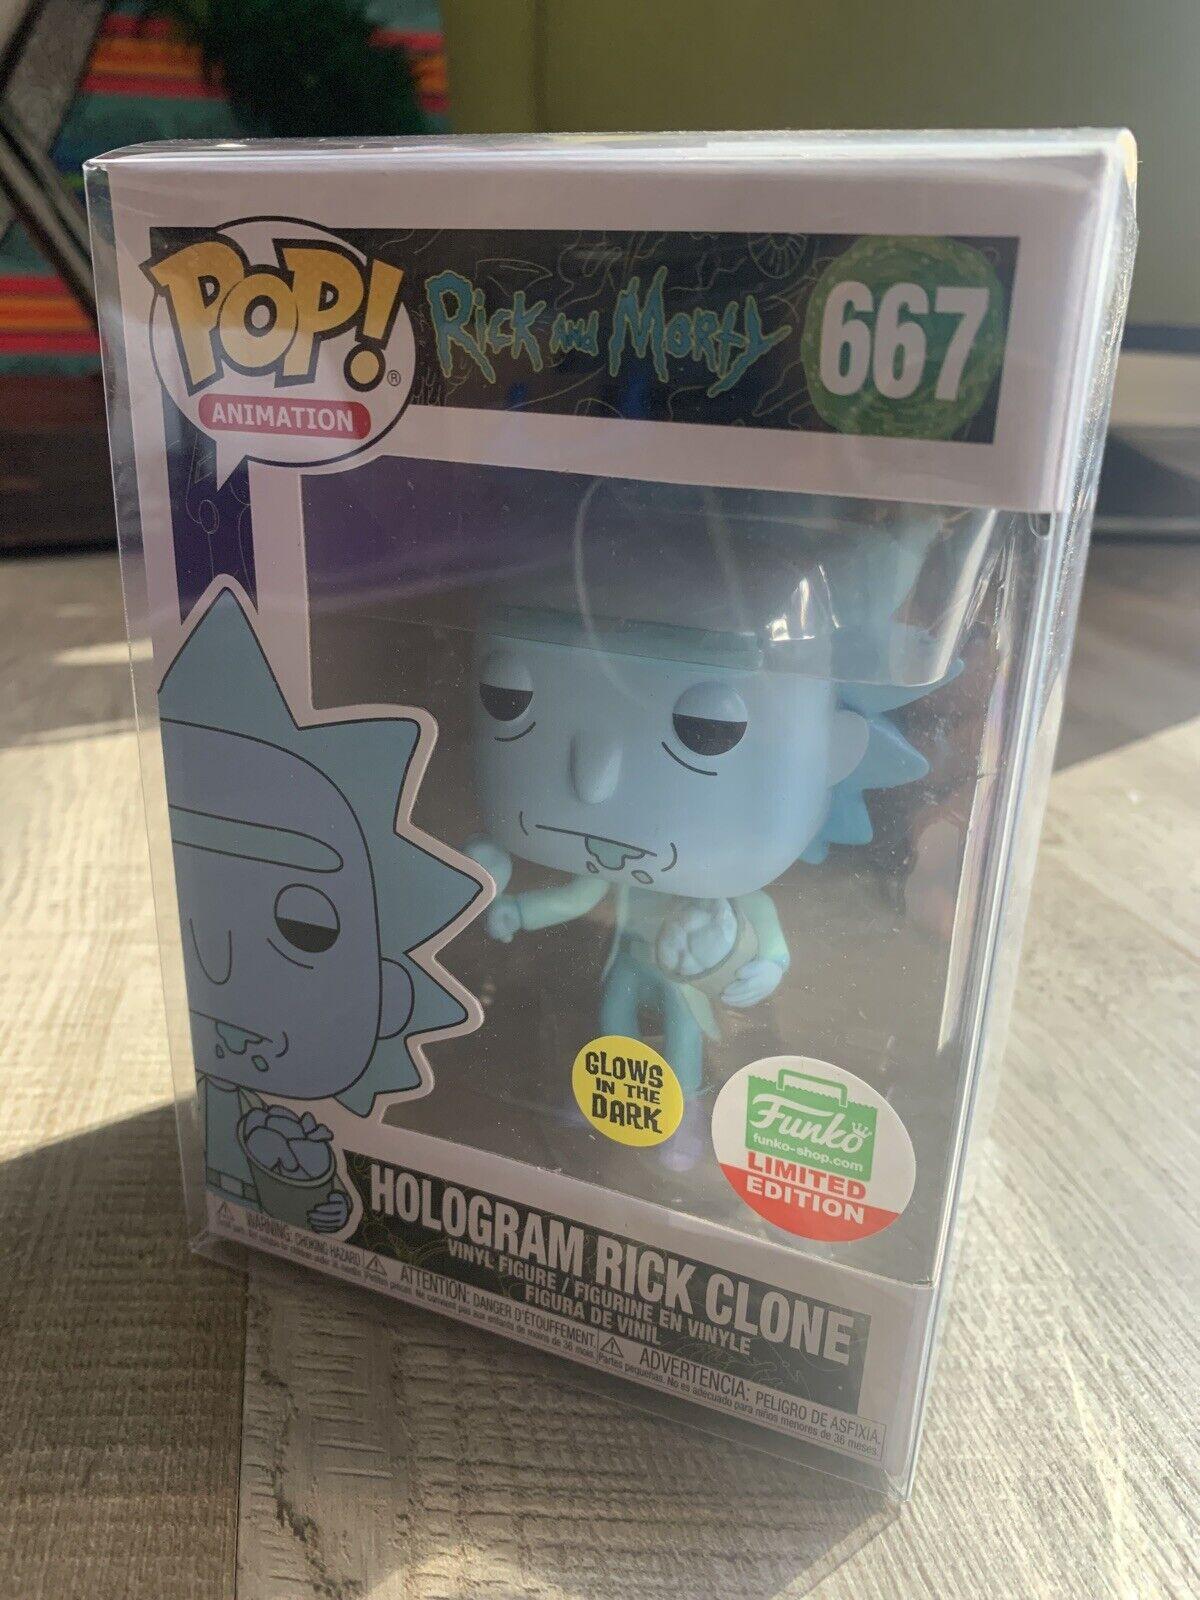 Funko Pop Keychain: Hologram Rick Clone Rick /& Morty 2019, Toy NUEVO